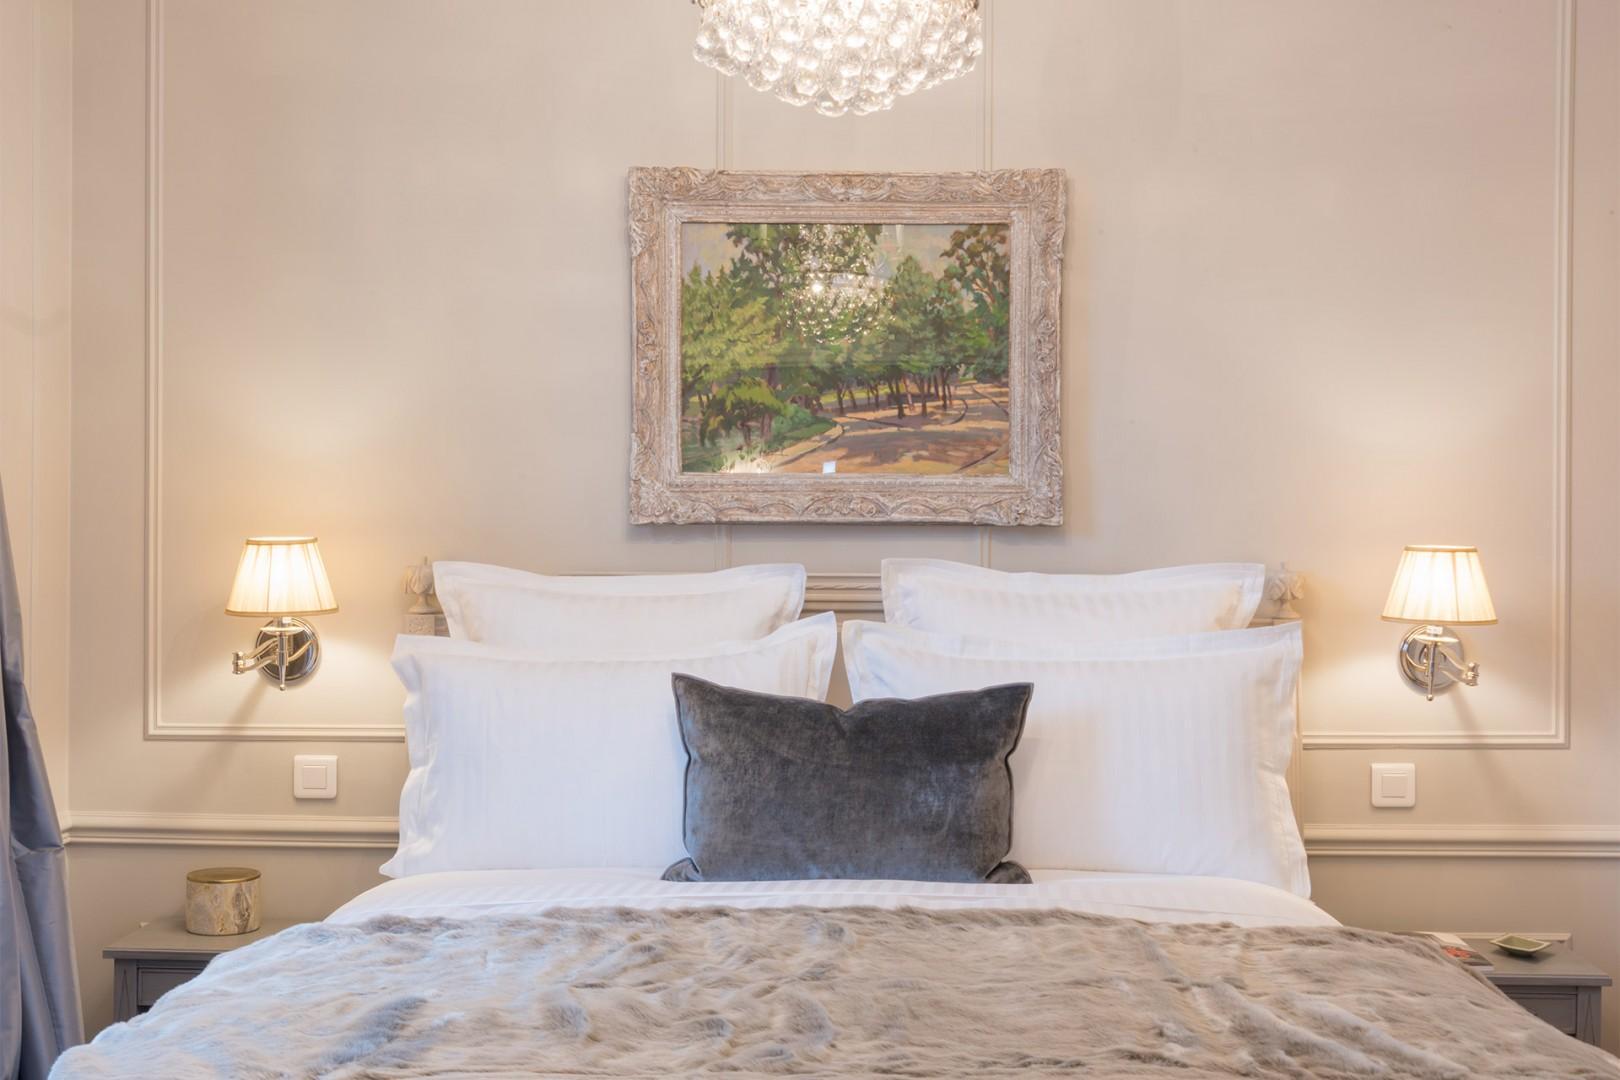 Soft romantic lighting in the bedroom